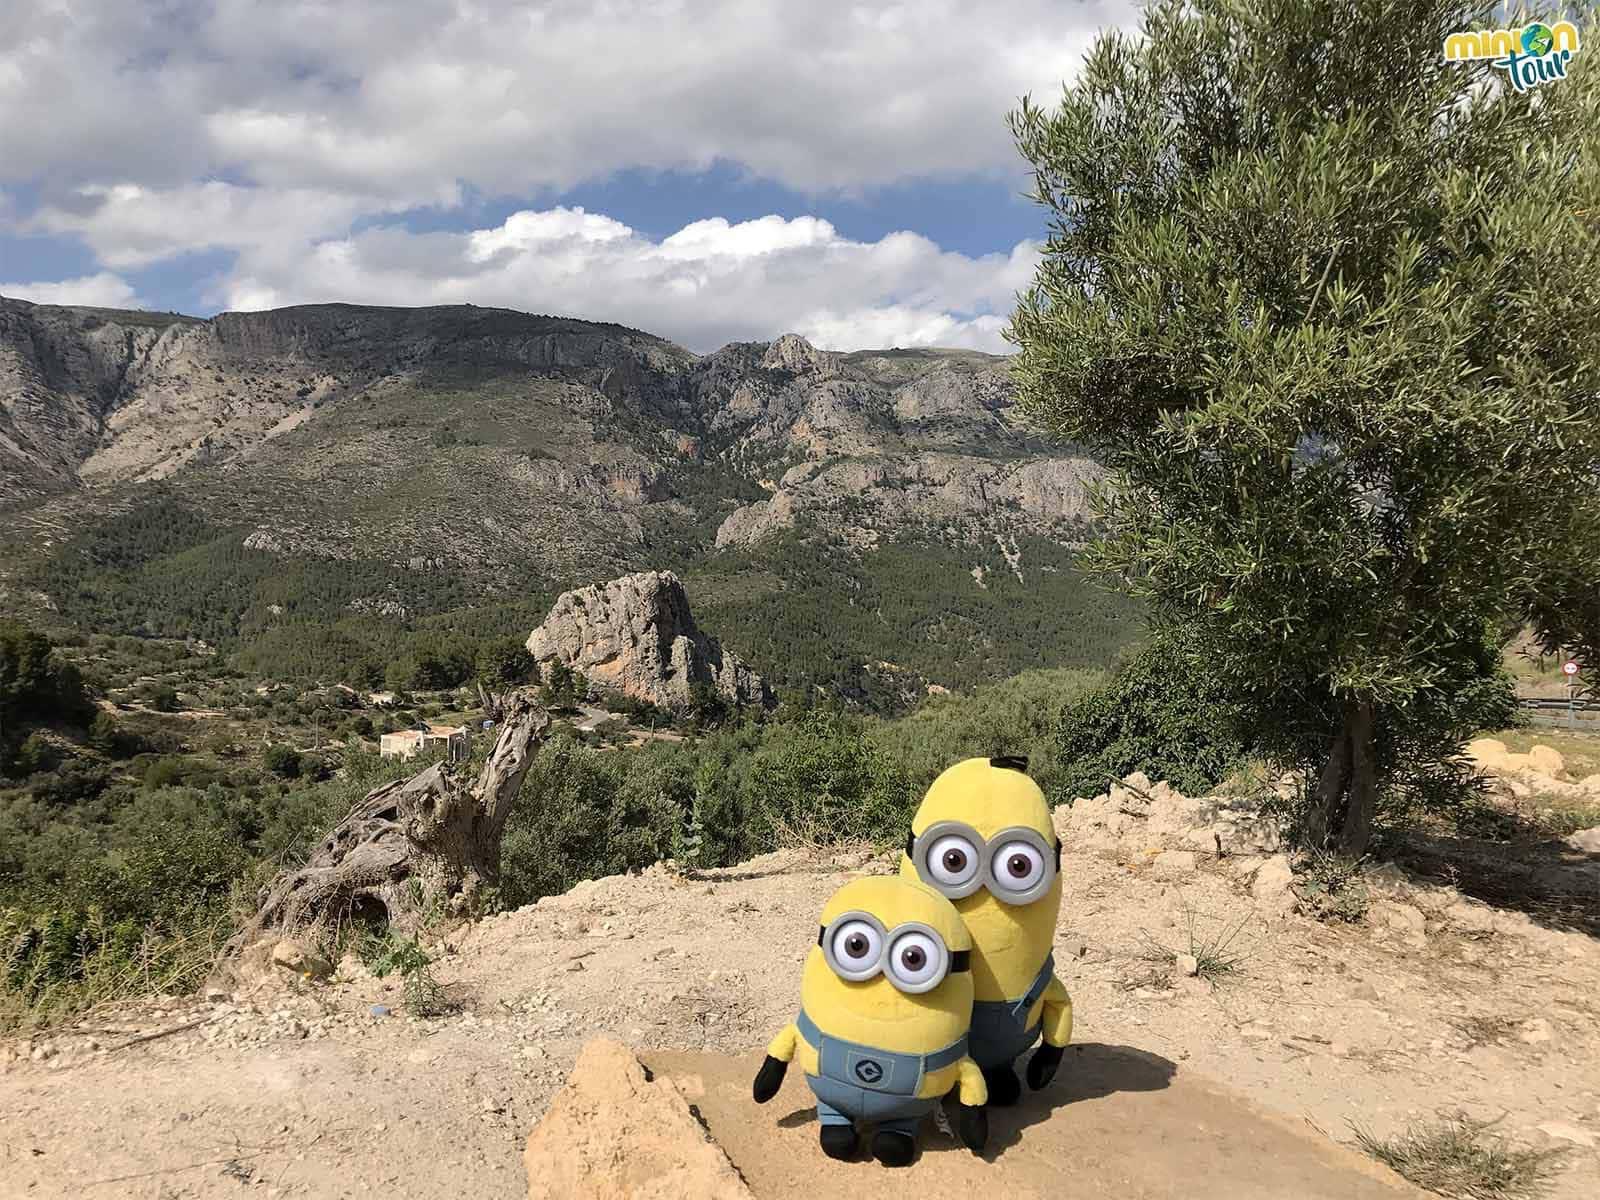 Los paisajes de Guadalest son impresionantes